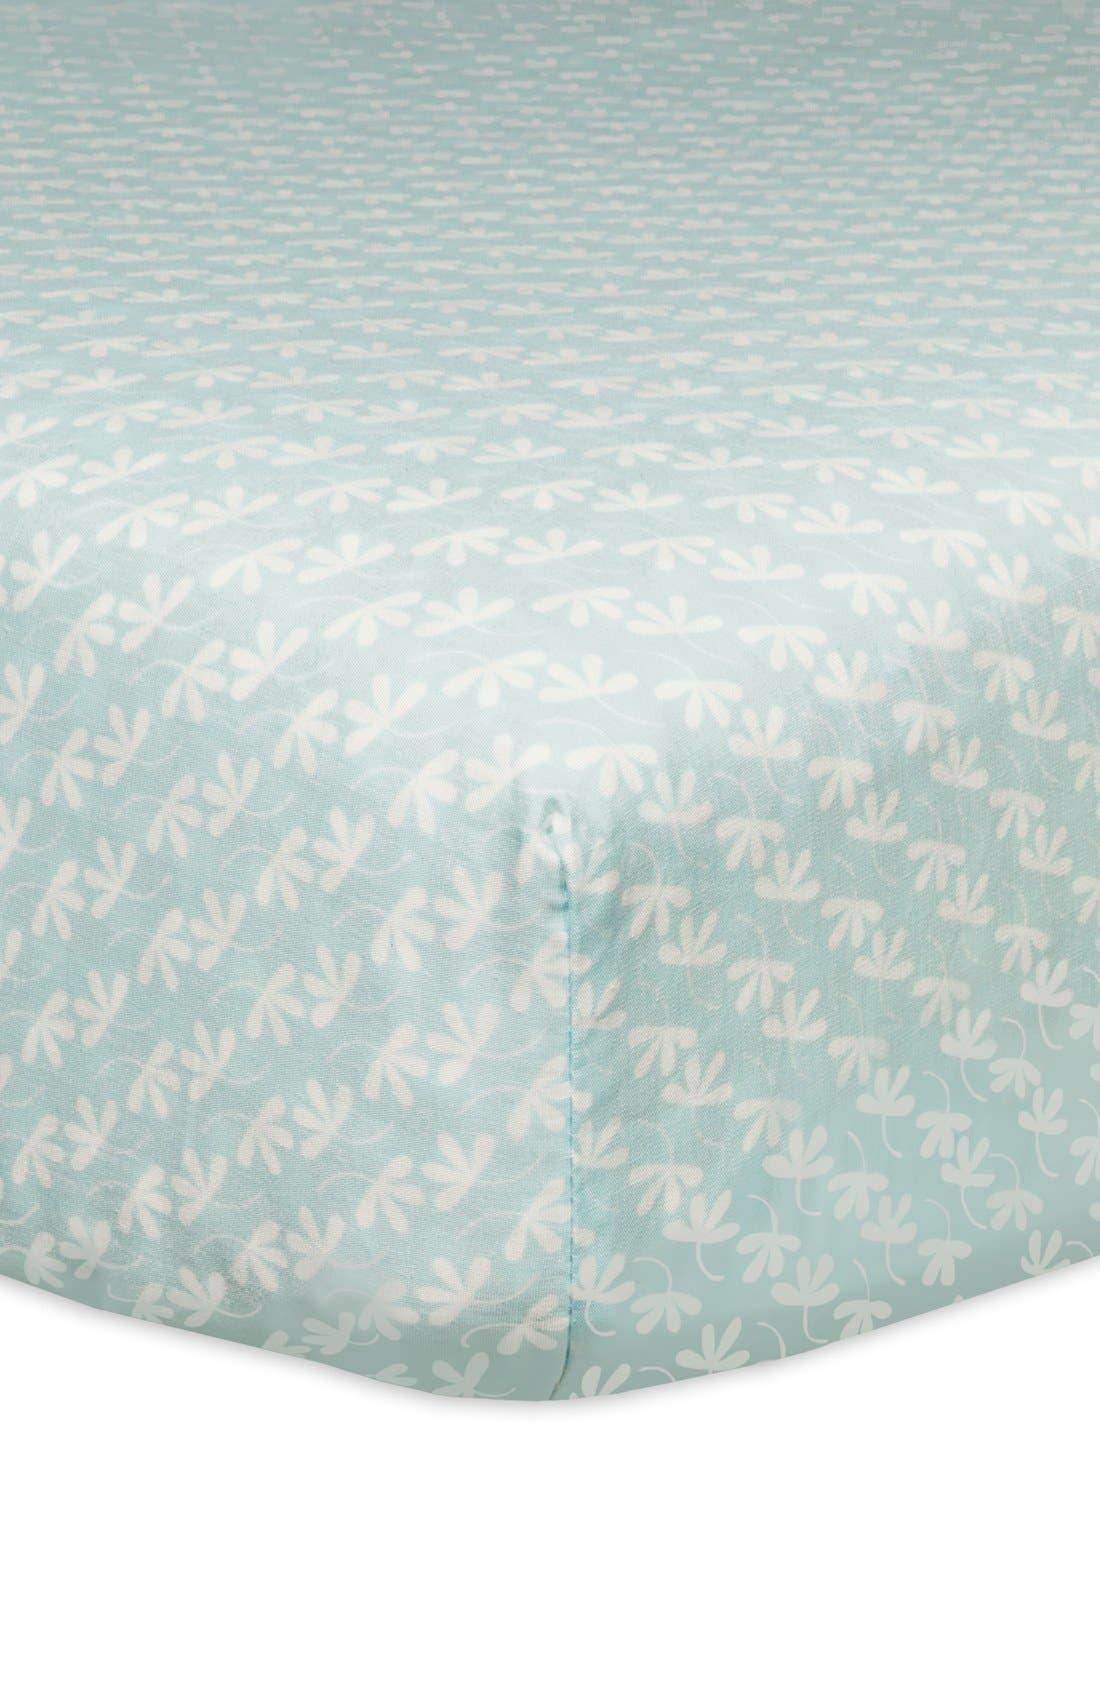 'Flora' Crib Sheet, Crib Skirt, Stroller Blanket & Wall Decals,                             Alternate thumbnail 2, color,                             400